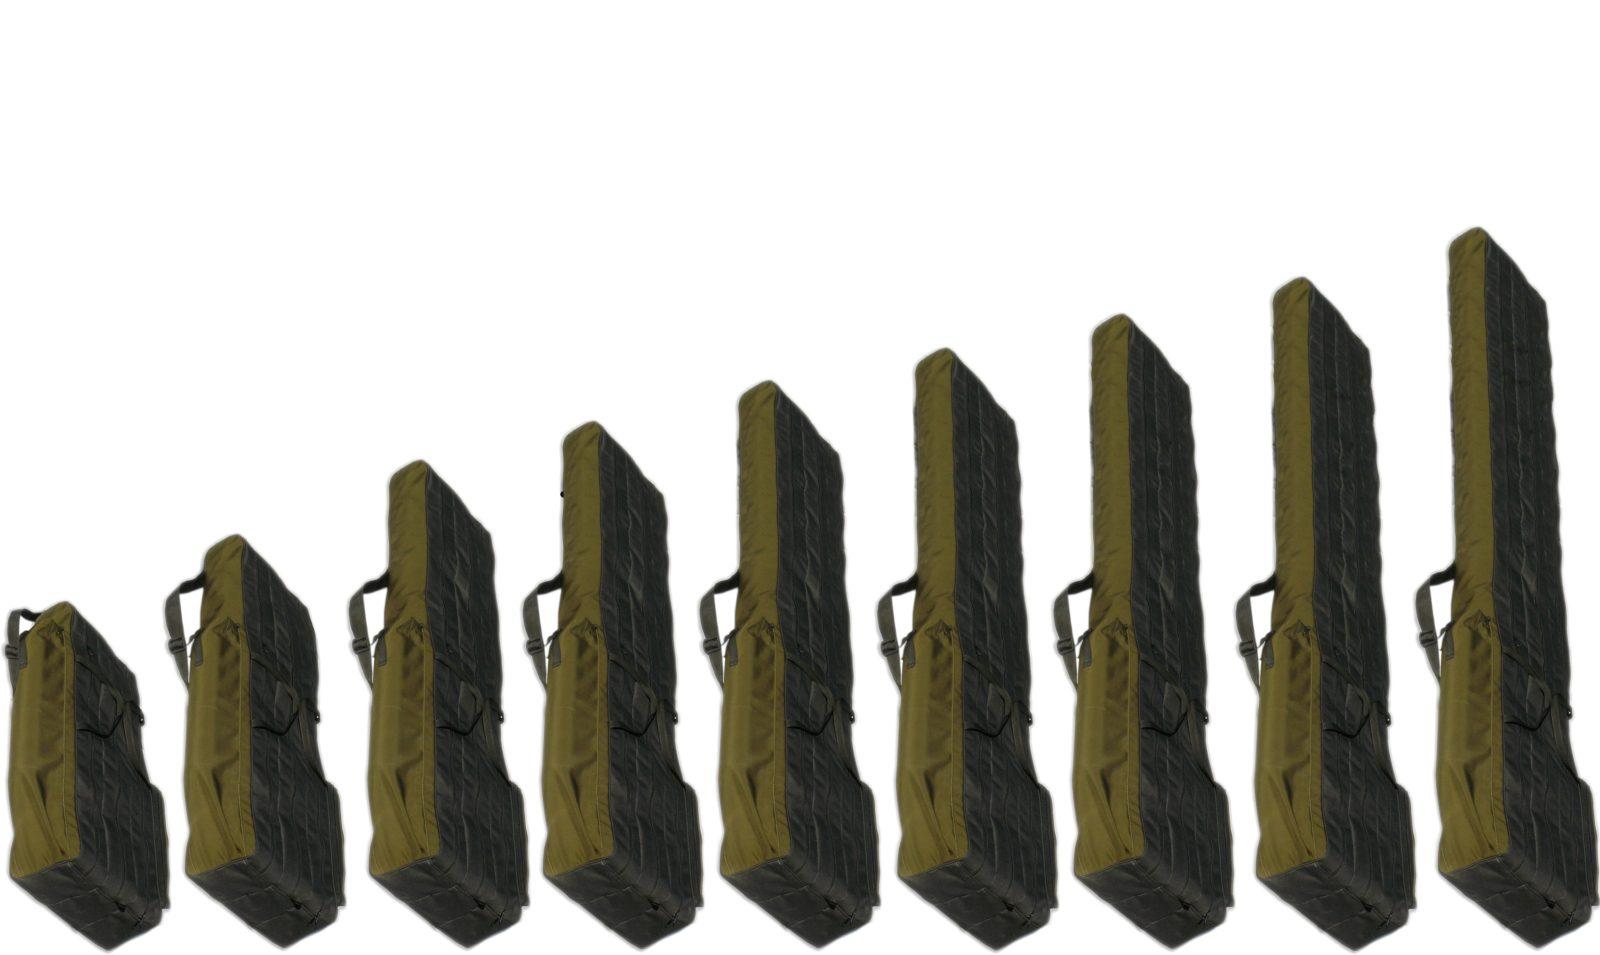 3 komory (pion)